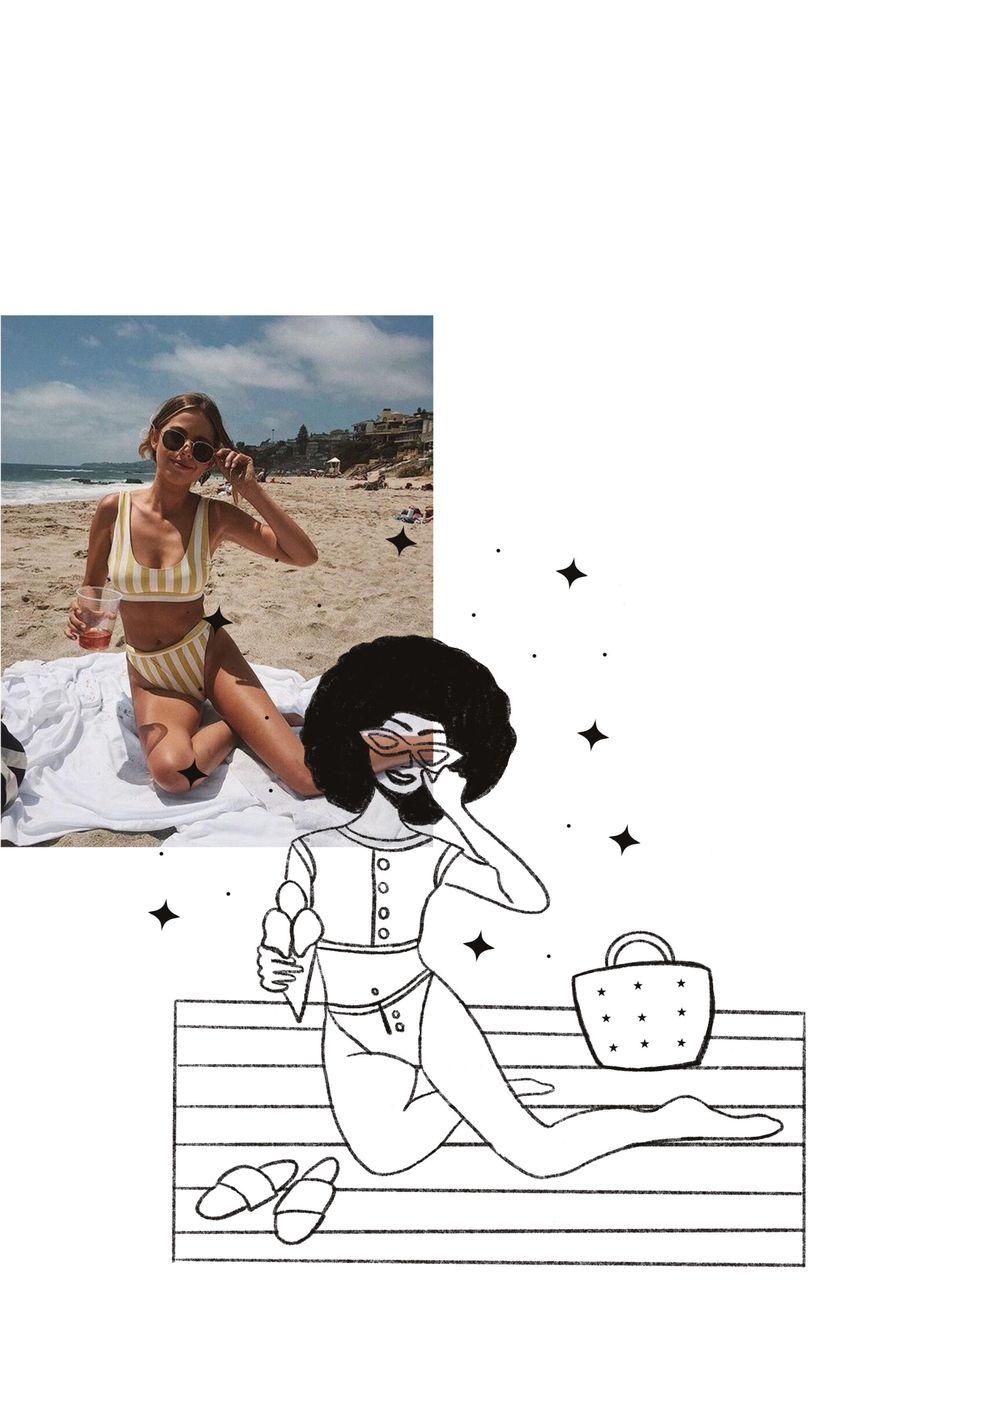 Bikini, Afro, and Ice cream - image 5 - student project